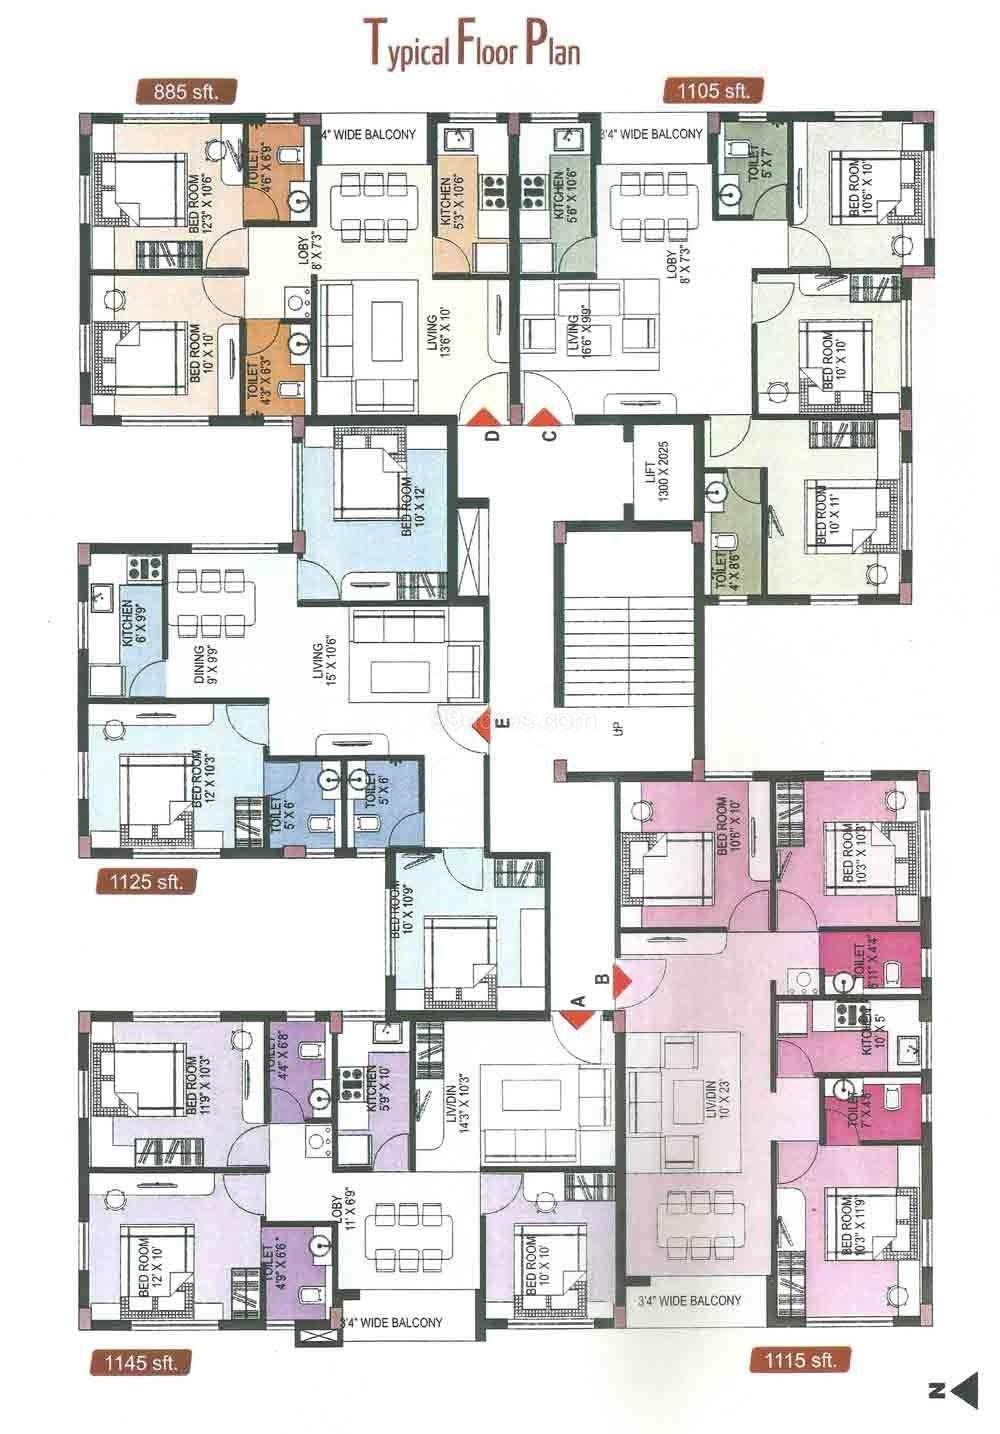 2 Bedroom Apartment Plans  httpwwwdesignbvildcom